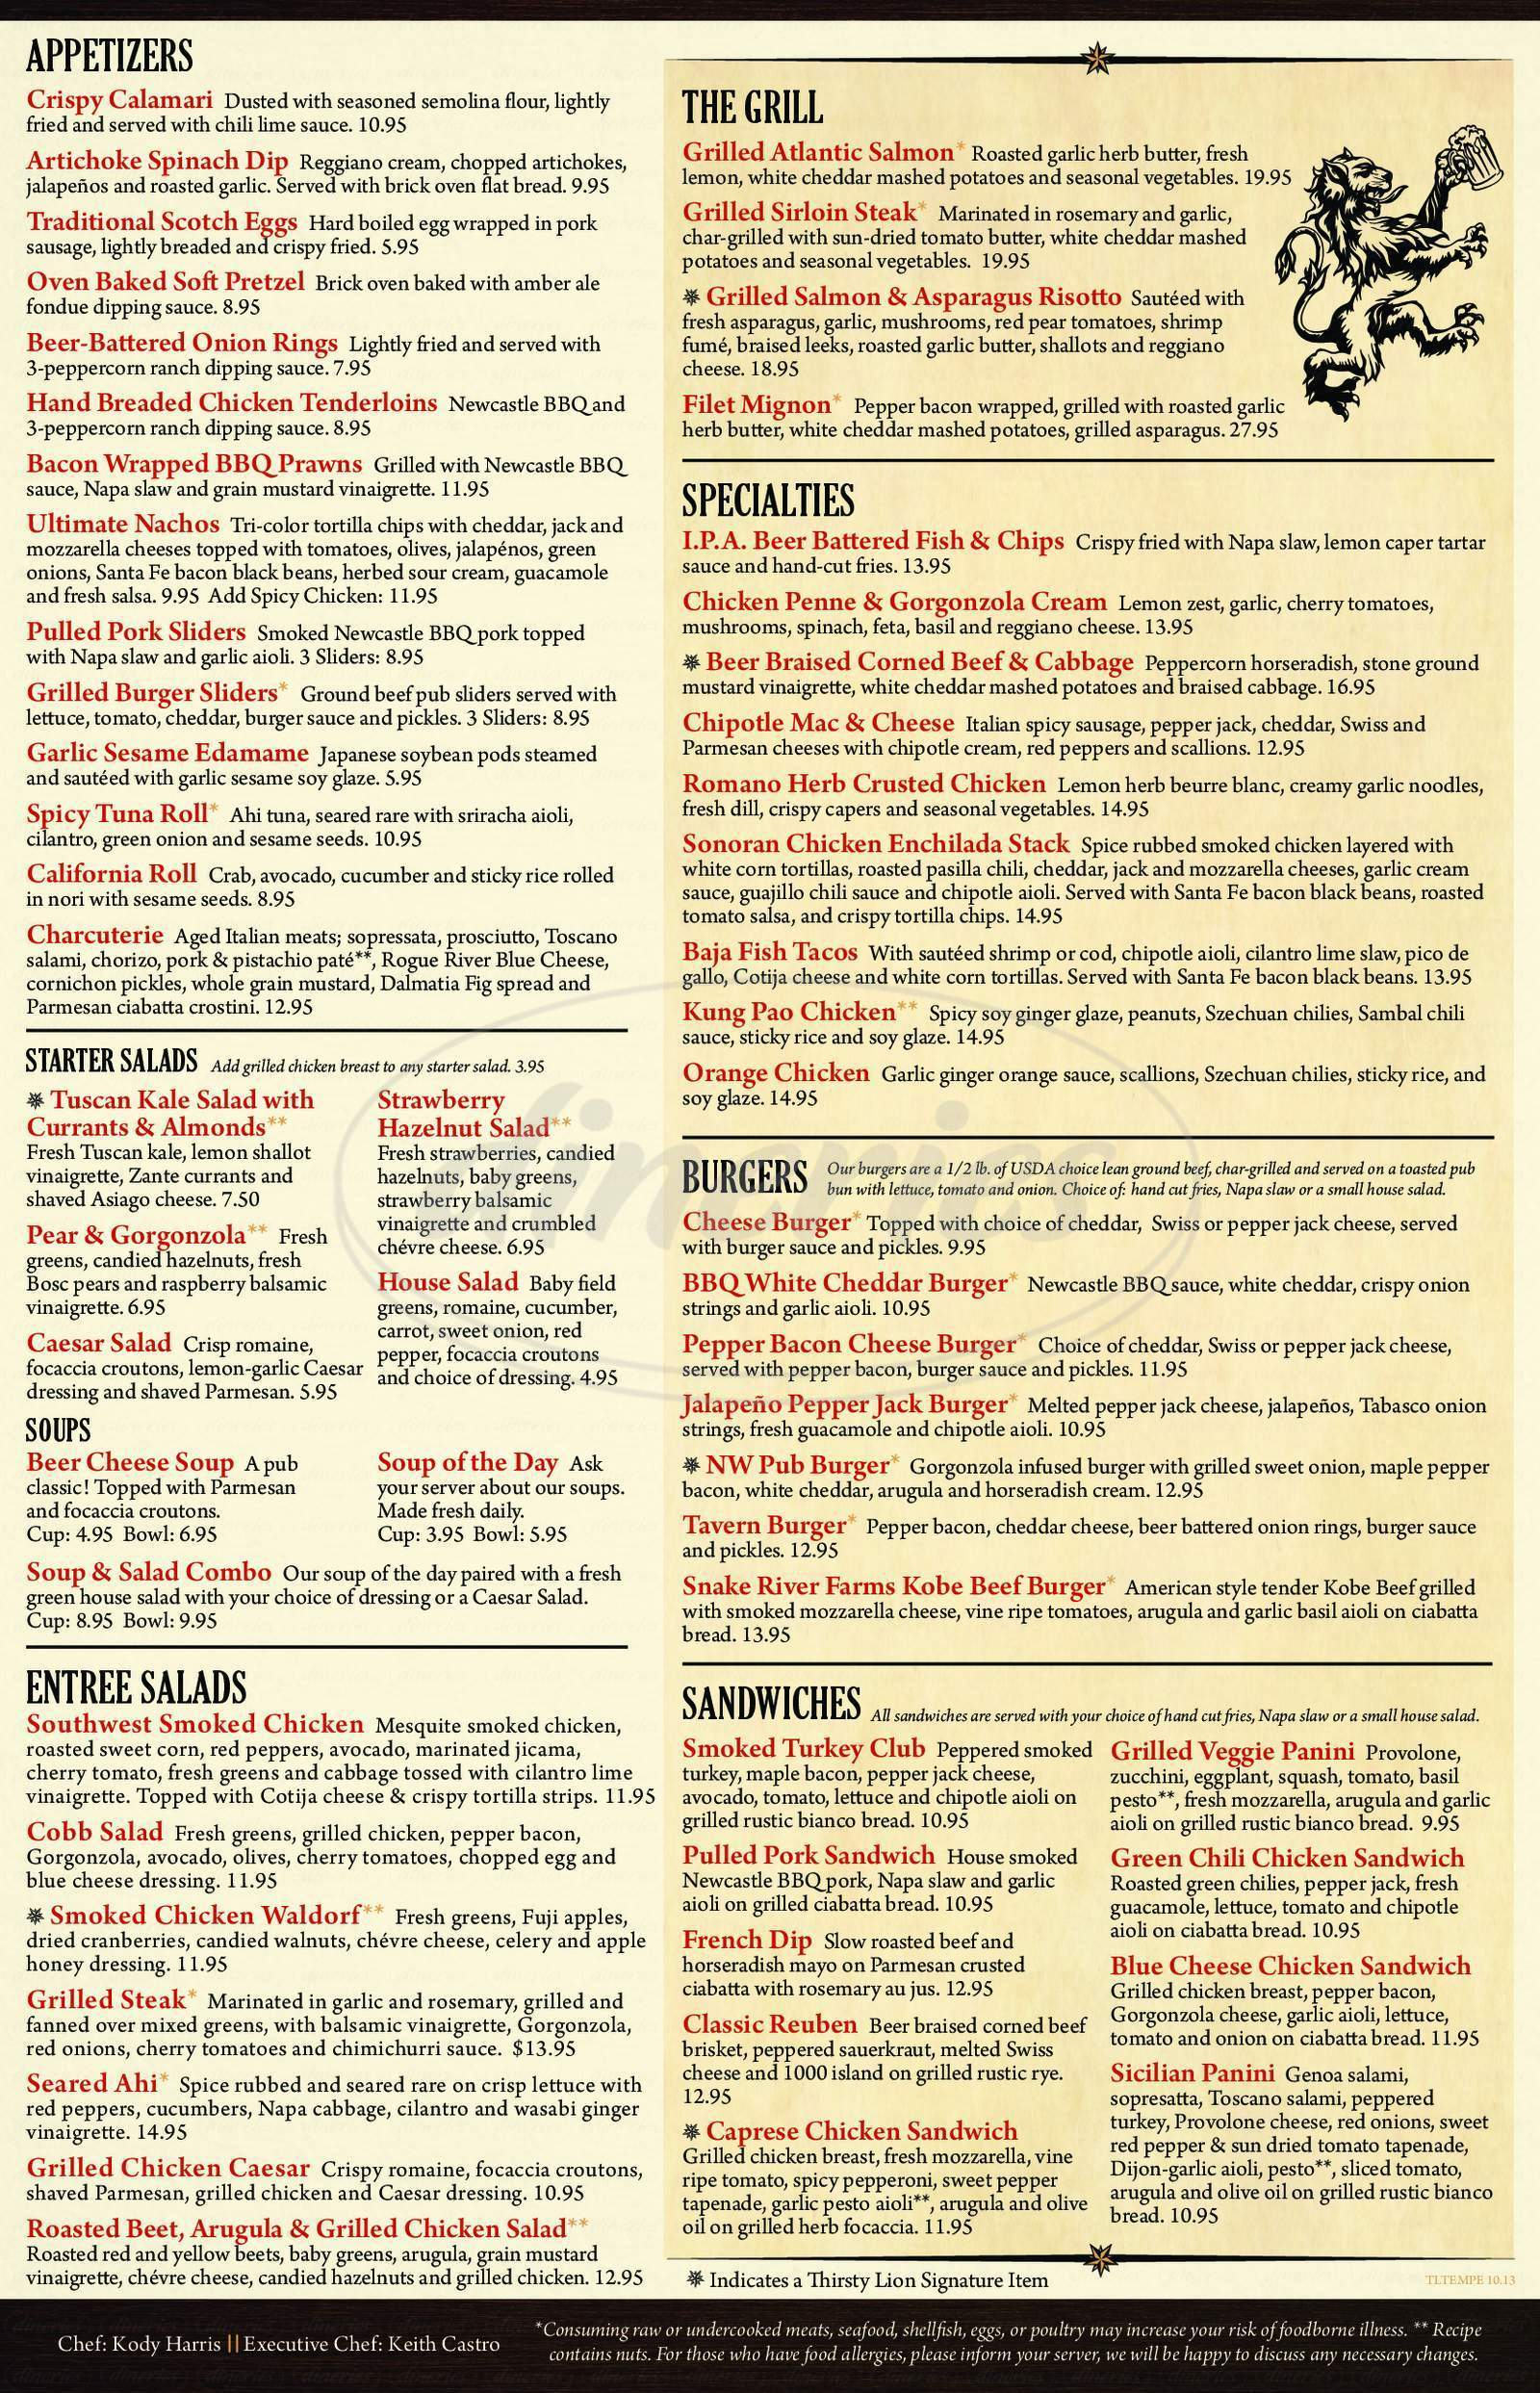 menu for Thirsty Lion Pub & Grill